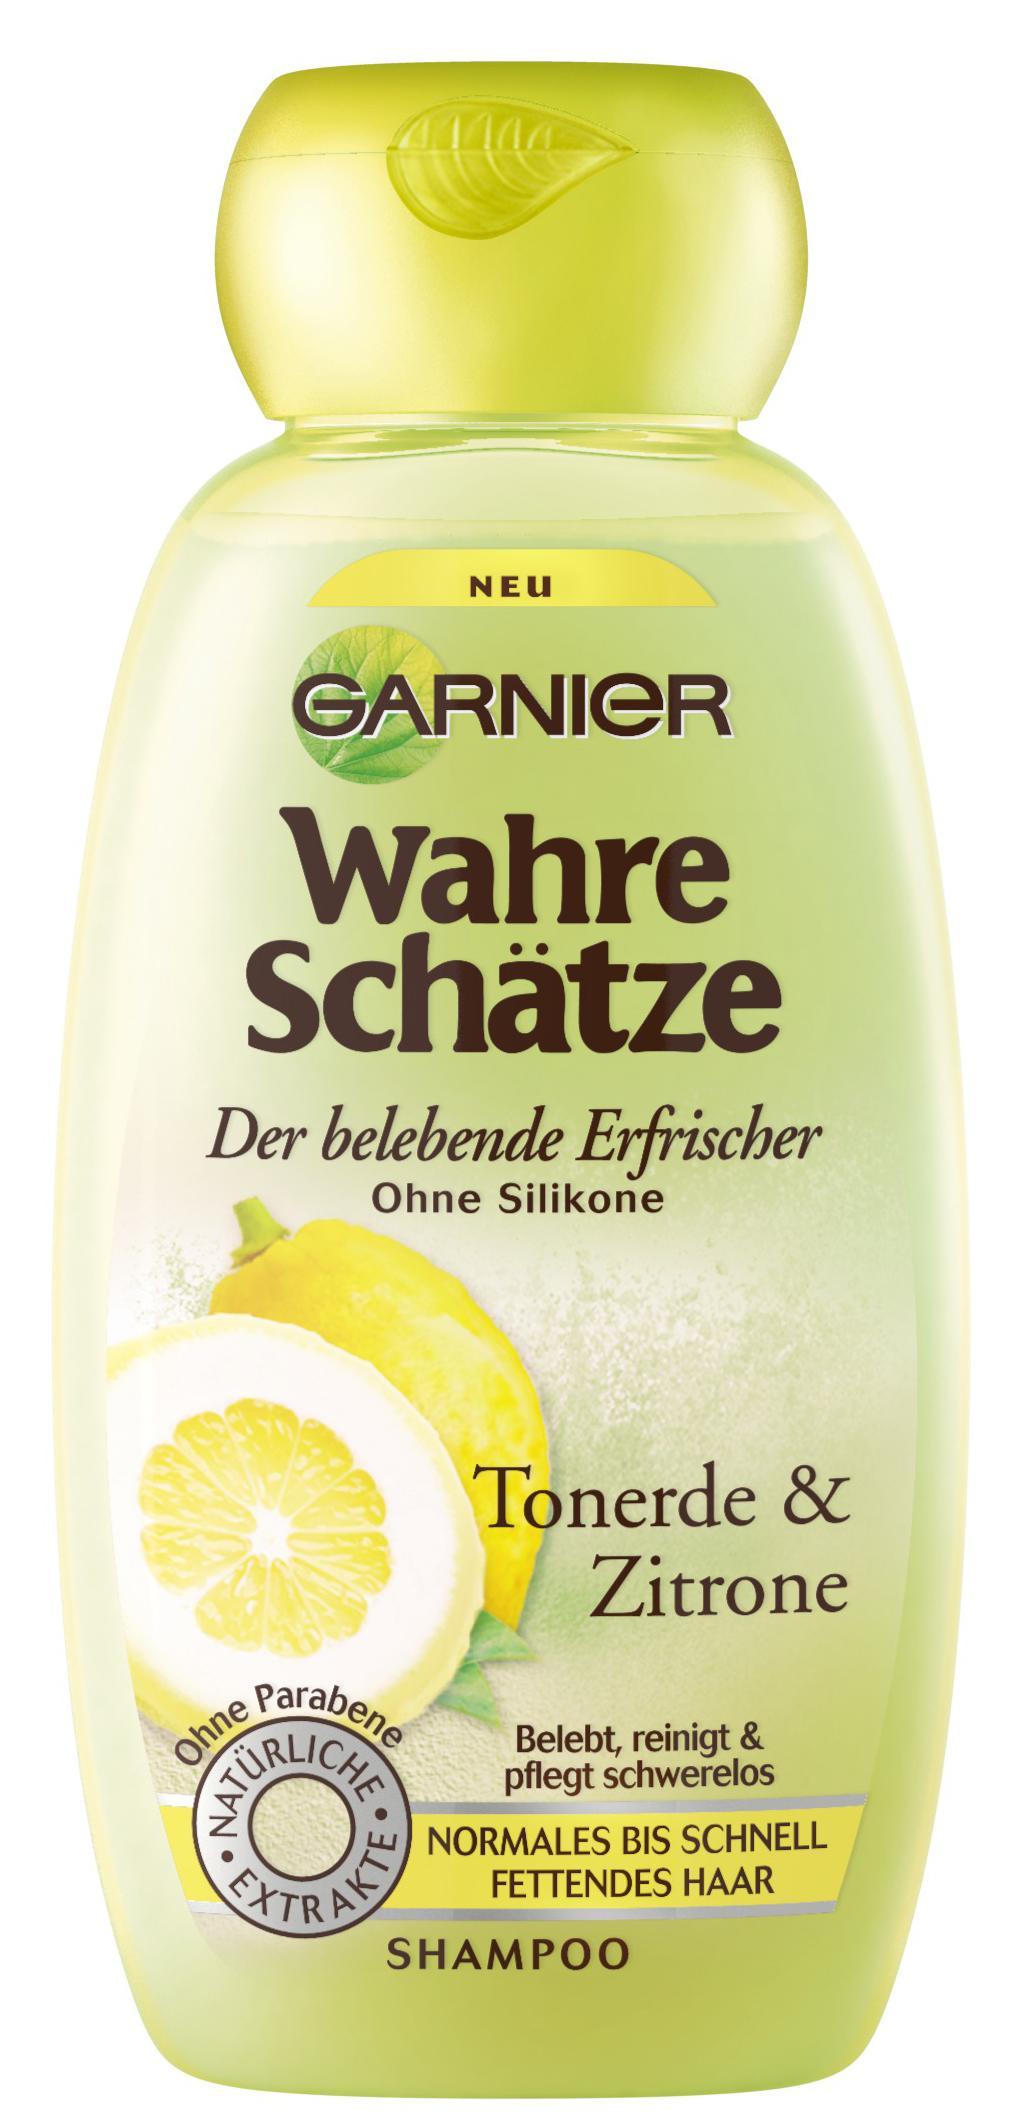 shampoo schnell fettendes haar test shampoo head shoulders anti schuppen shampoo lemongrass f r. Black Bedroom Furniture Sets. Home Design Ideas